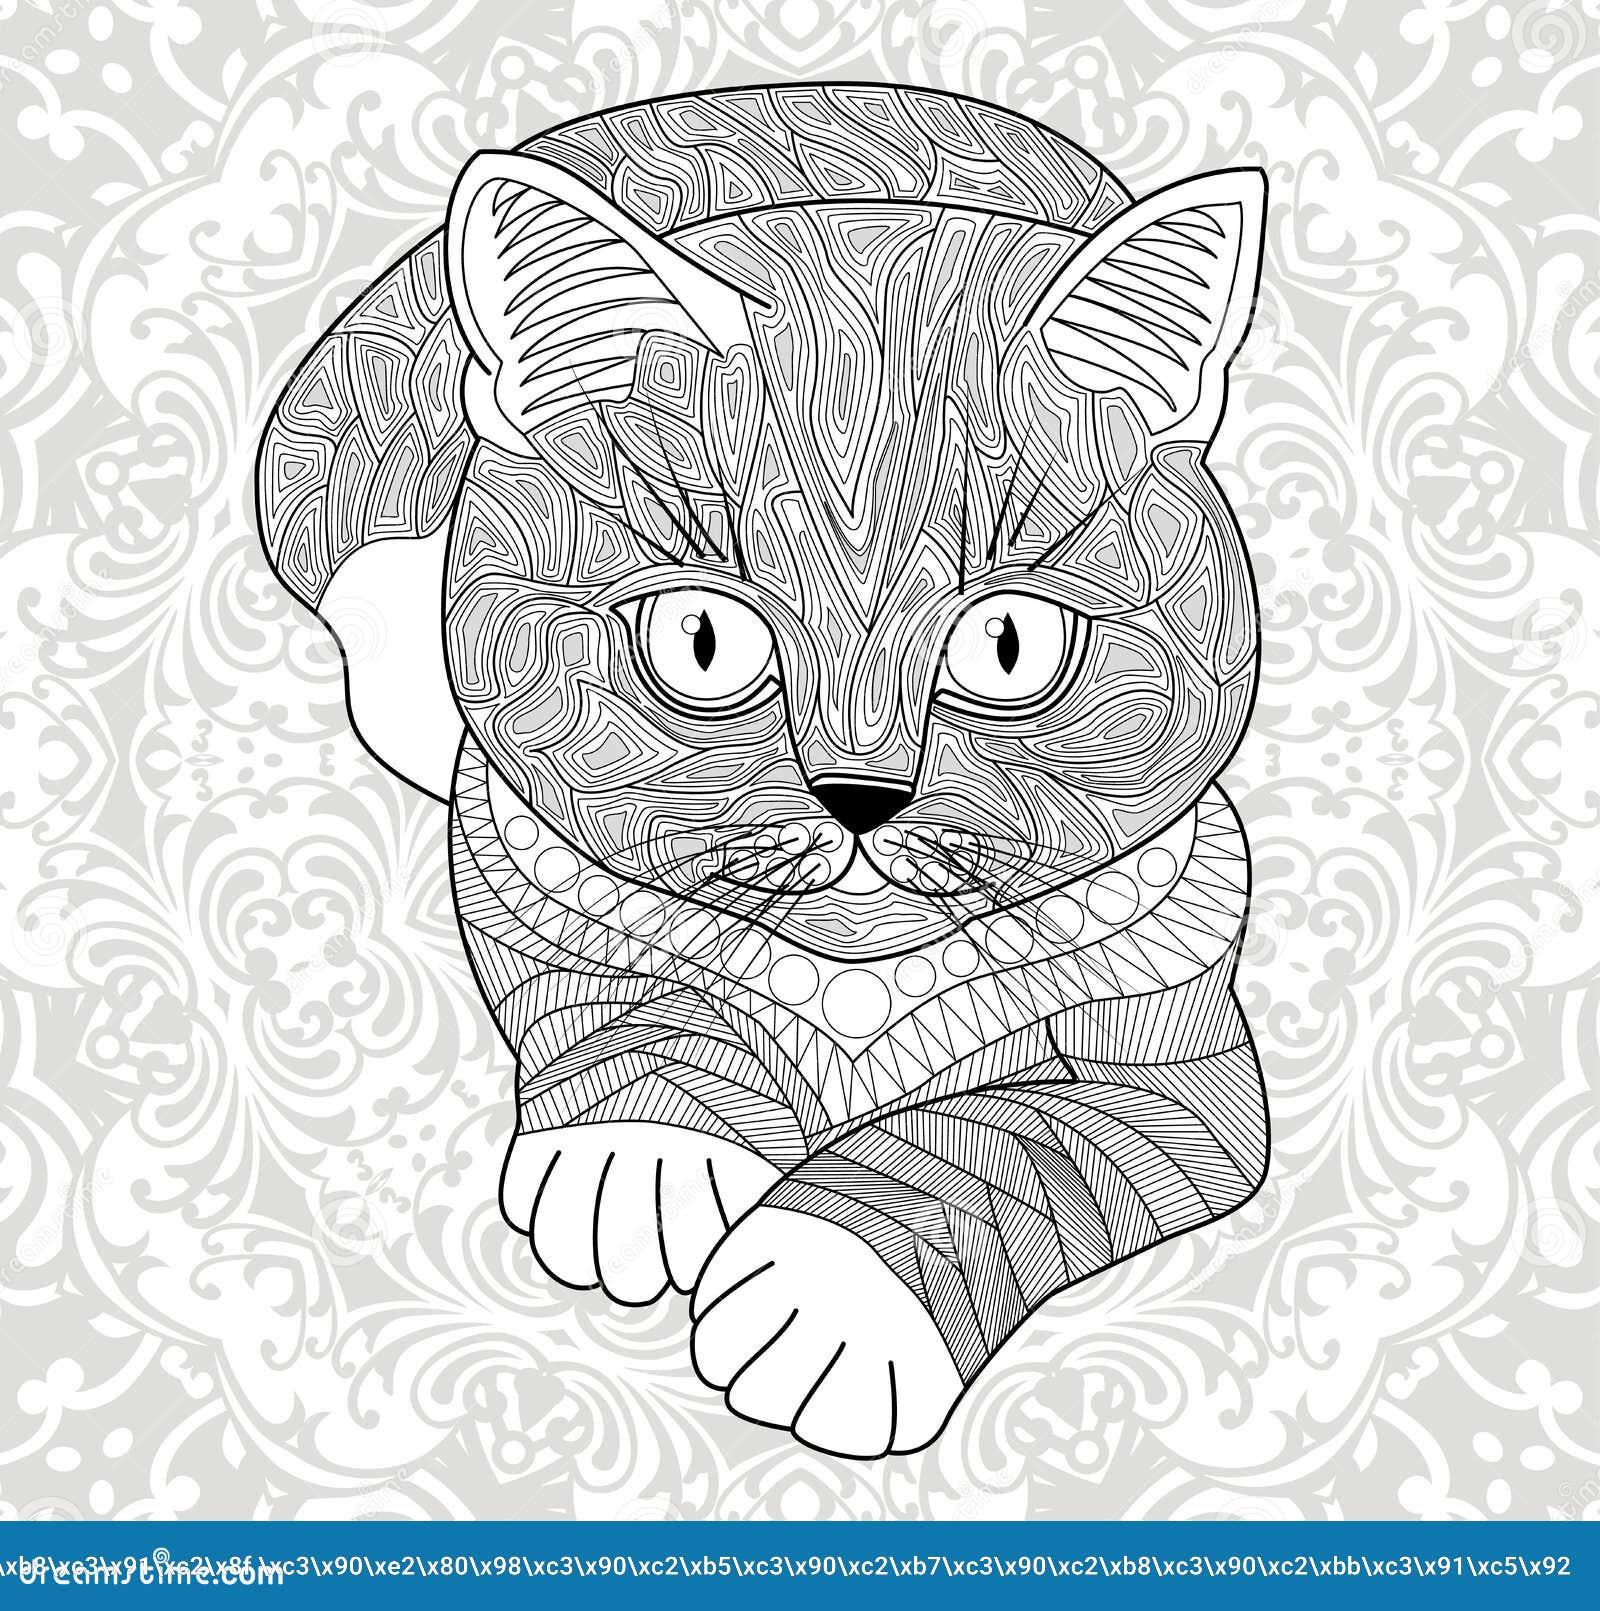 chat erwachsene Salzgitter